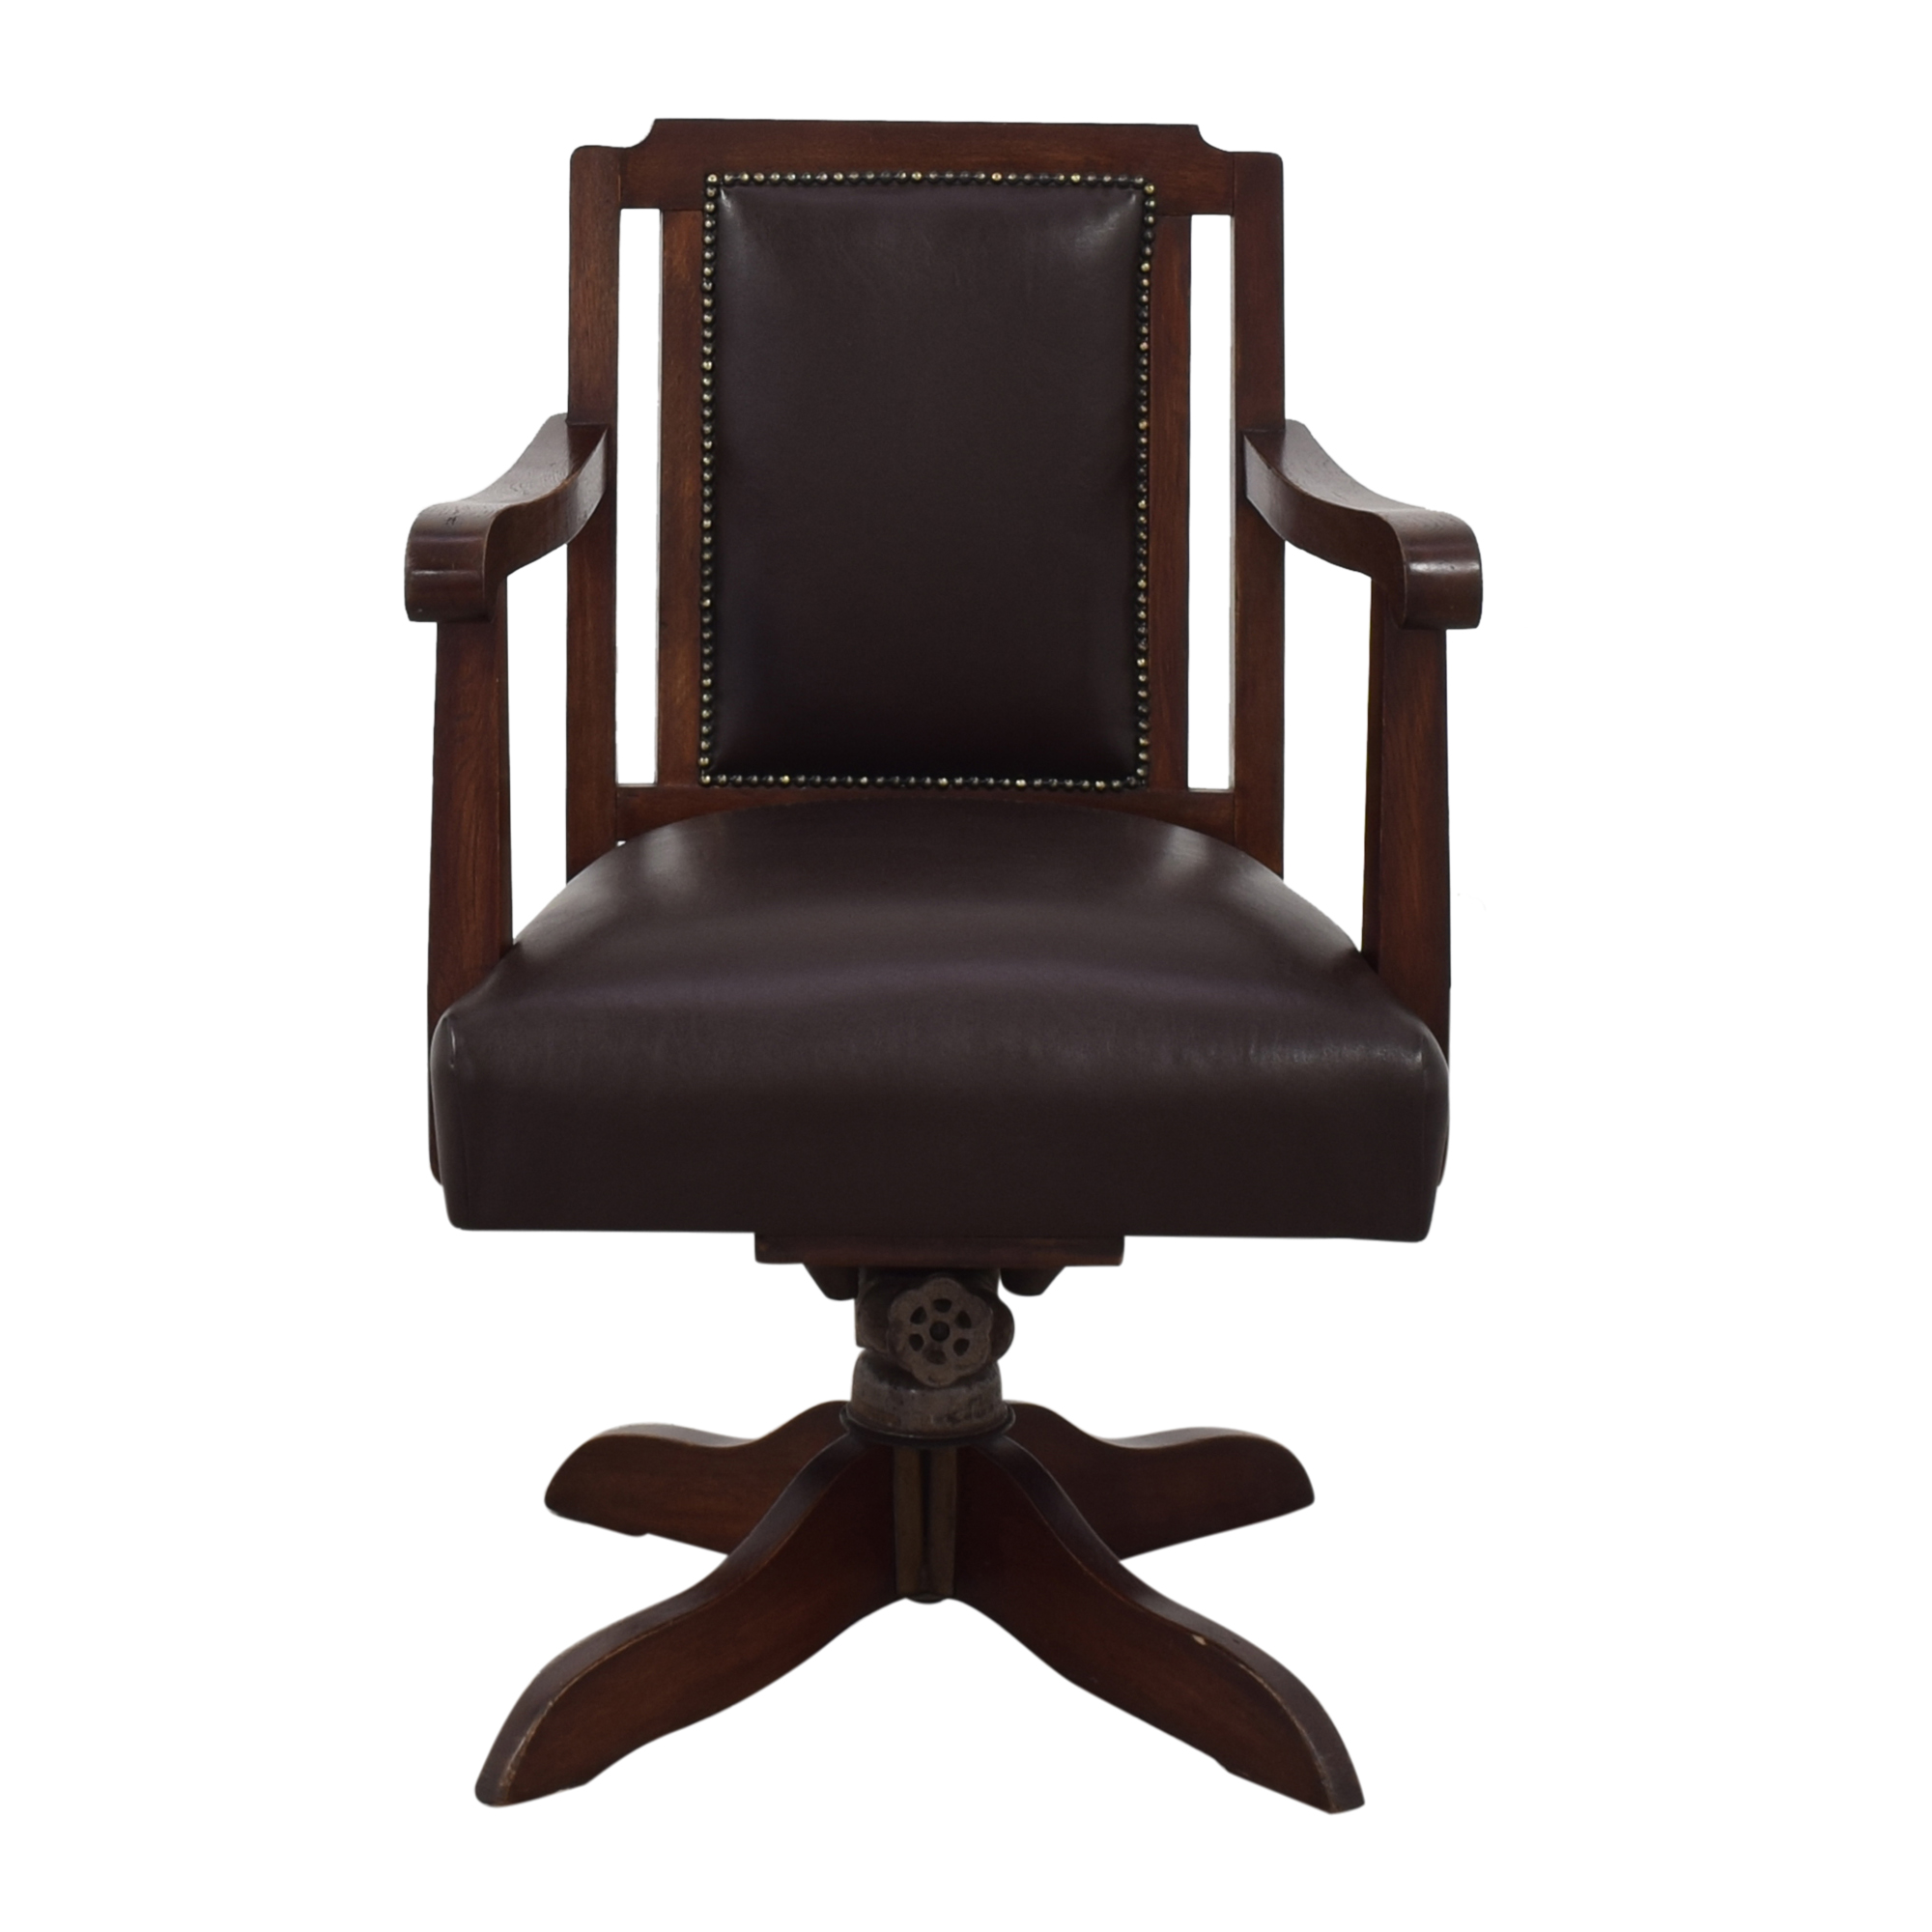 Hillcrest Chair Actions Hillcrest Swivel Desk Chair discount